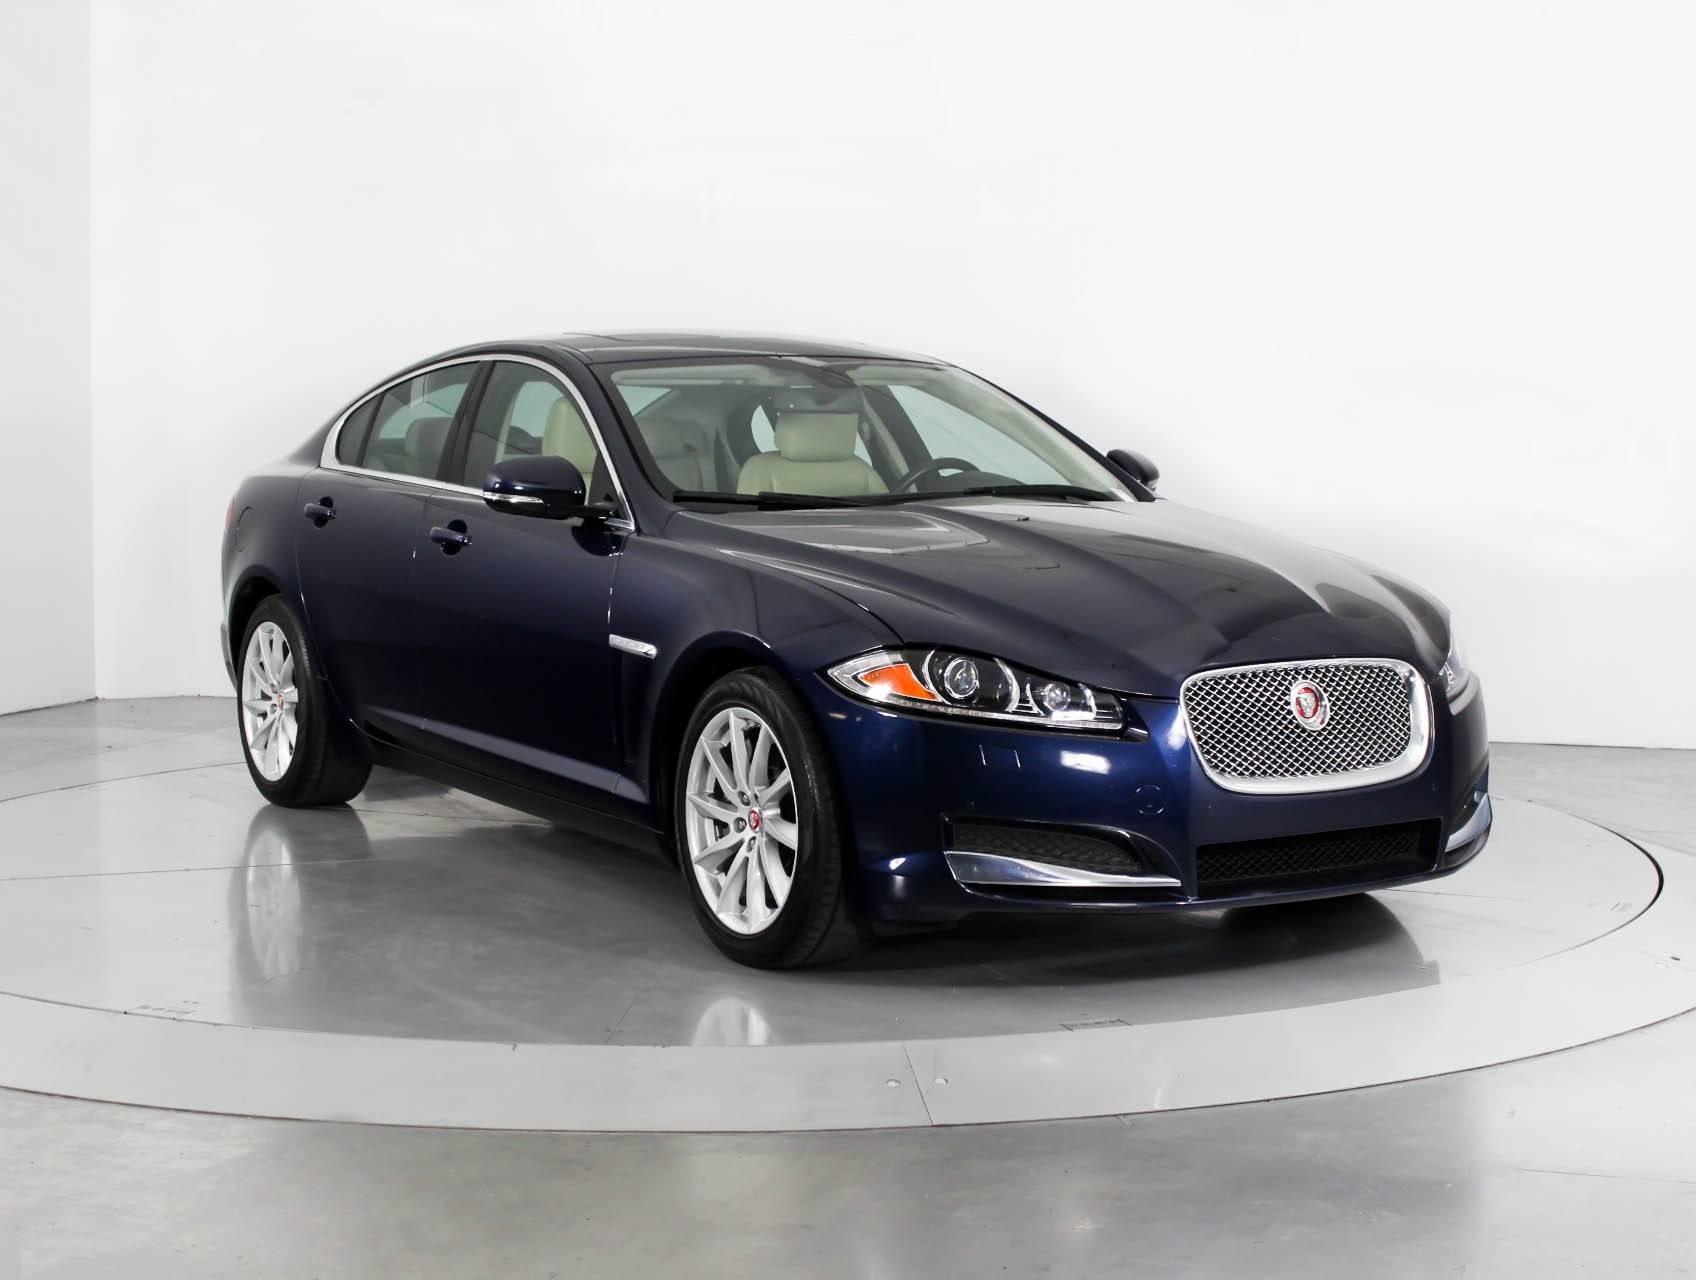 xf jaguar sedan drive price reviews premium features wheel rear exterior photos